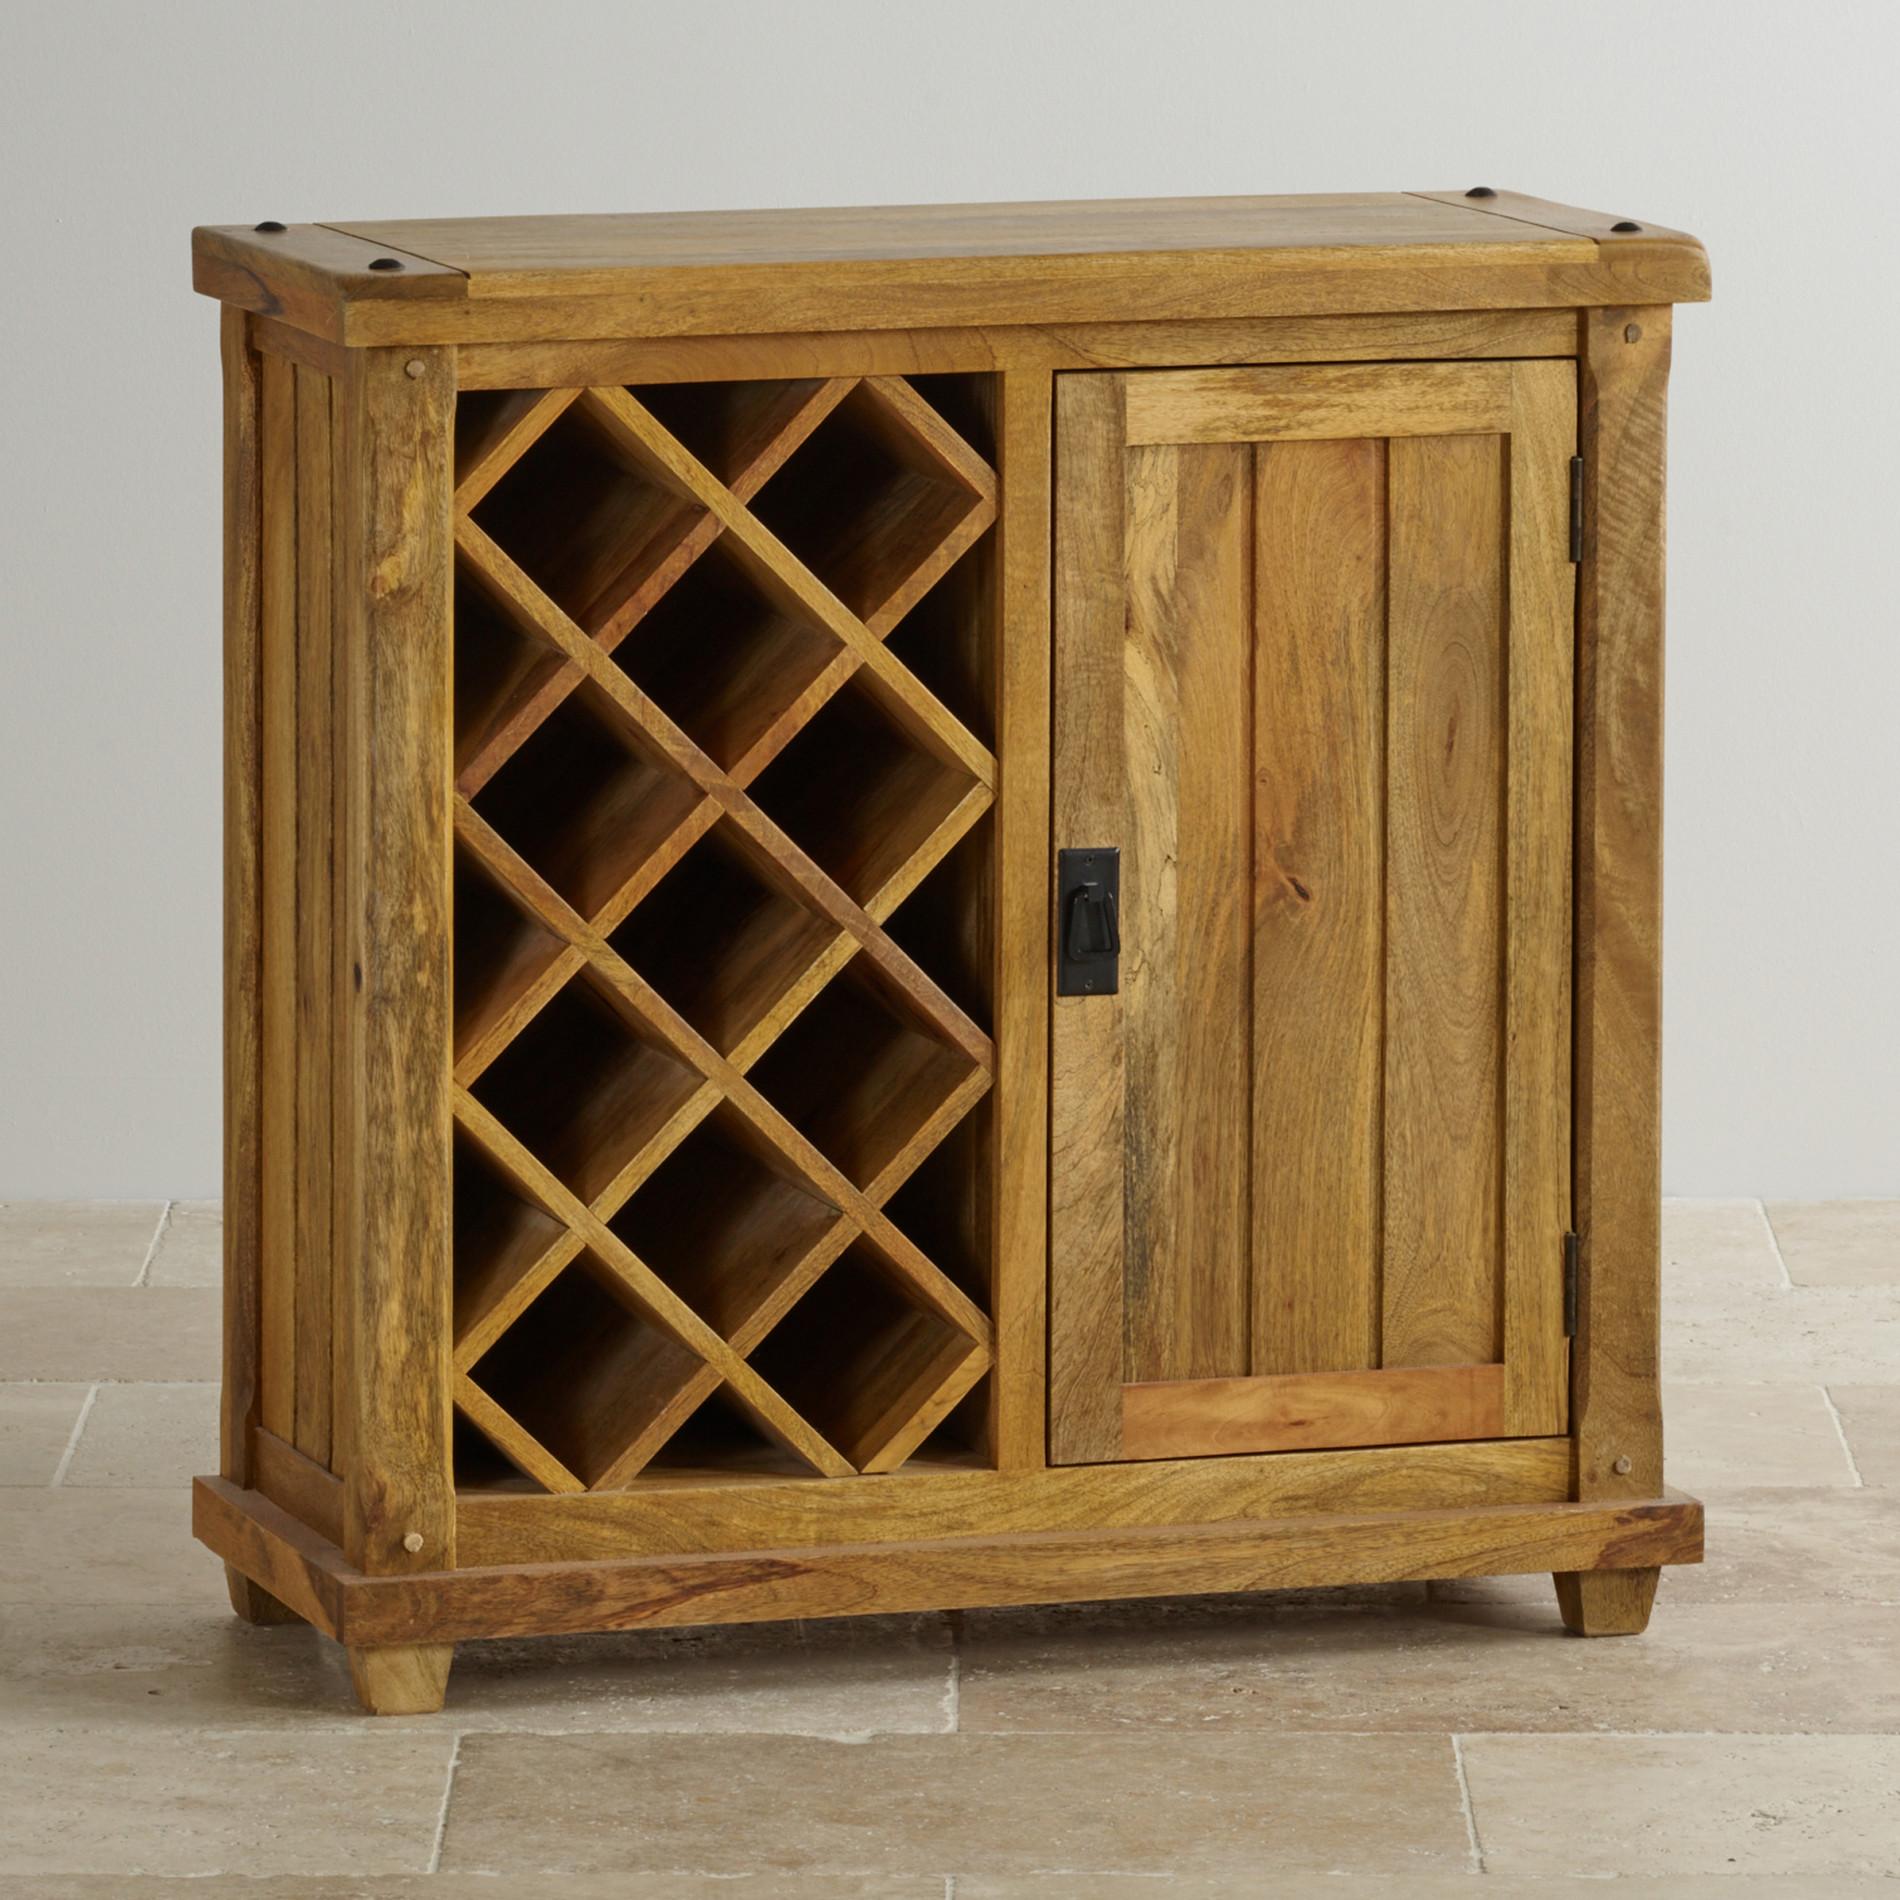 Baku Light Wine Cabinet in Natural Solid Mango